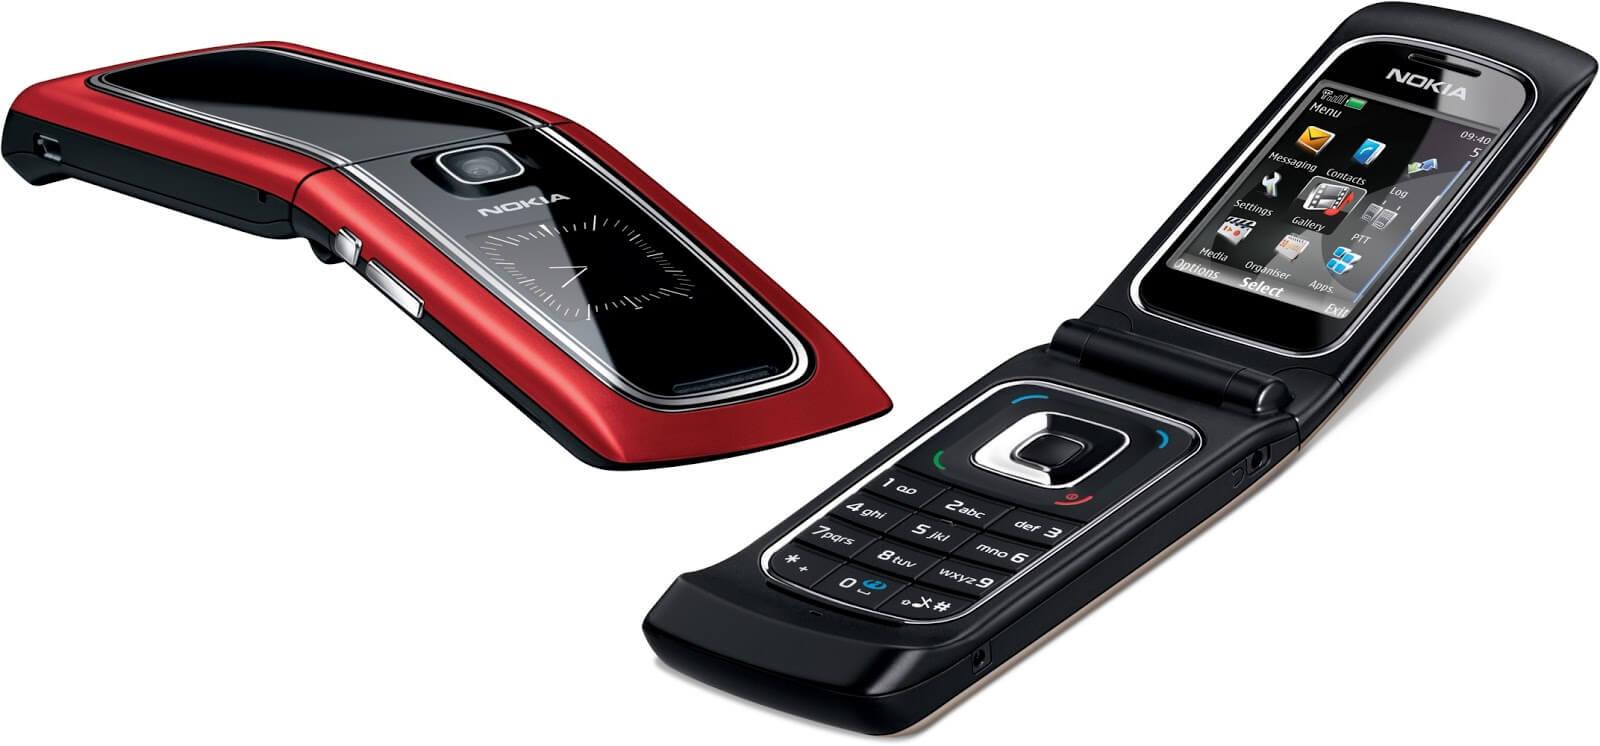 Представлен Nokia 6555